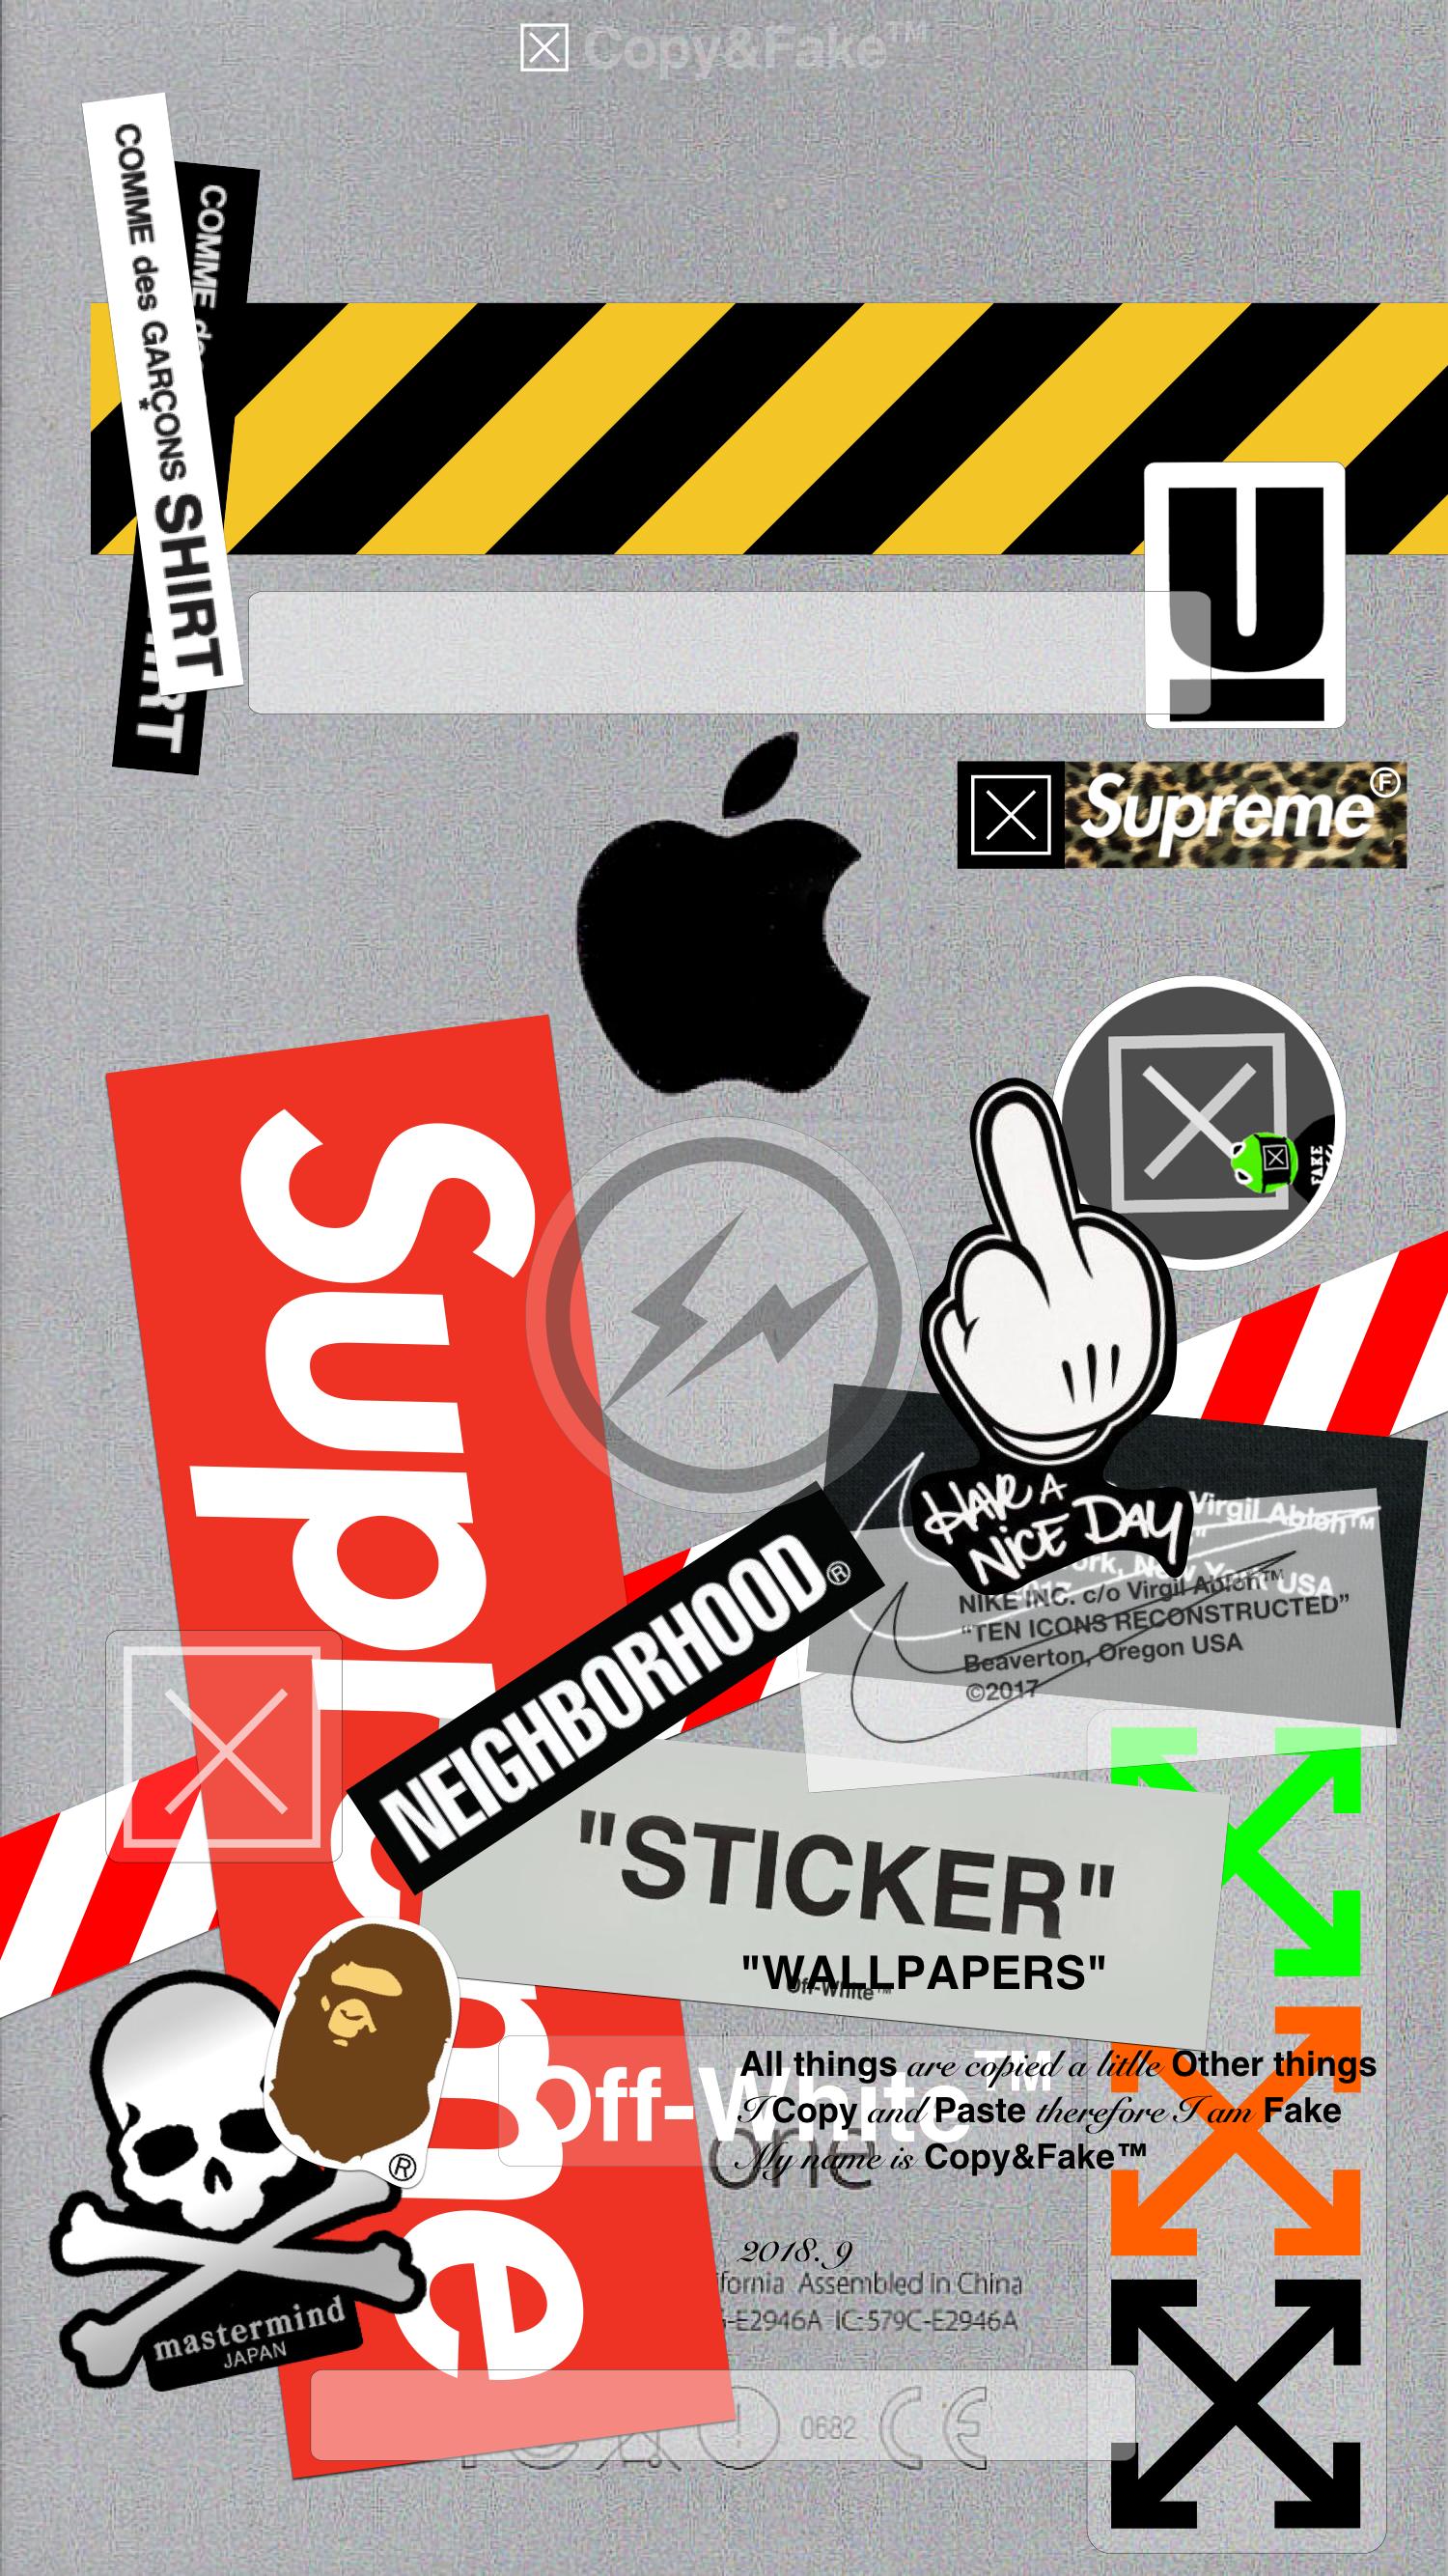 Copy Fake Custom Stickers Wallpaper Stickers Kit Instagram